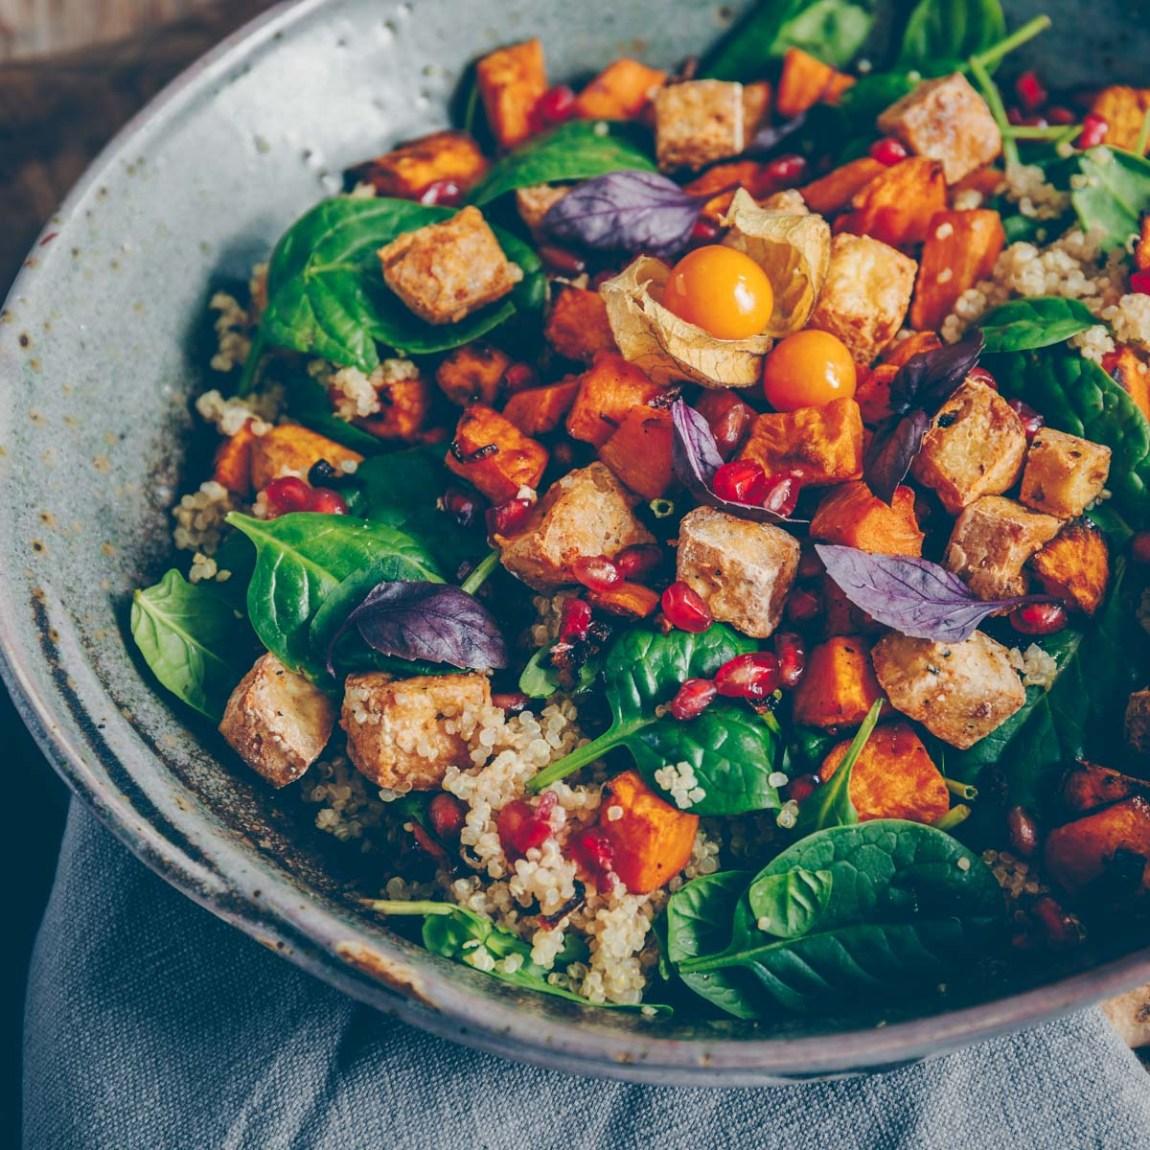 Bunter Salat mit Süsskartoffel, Tofu und Quinoa